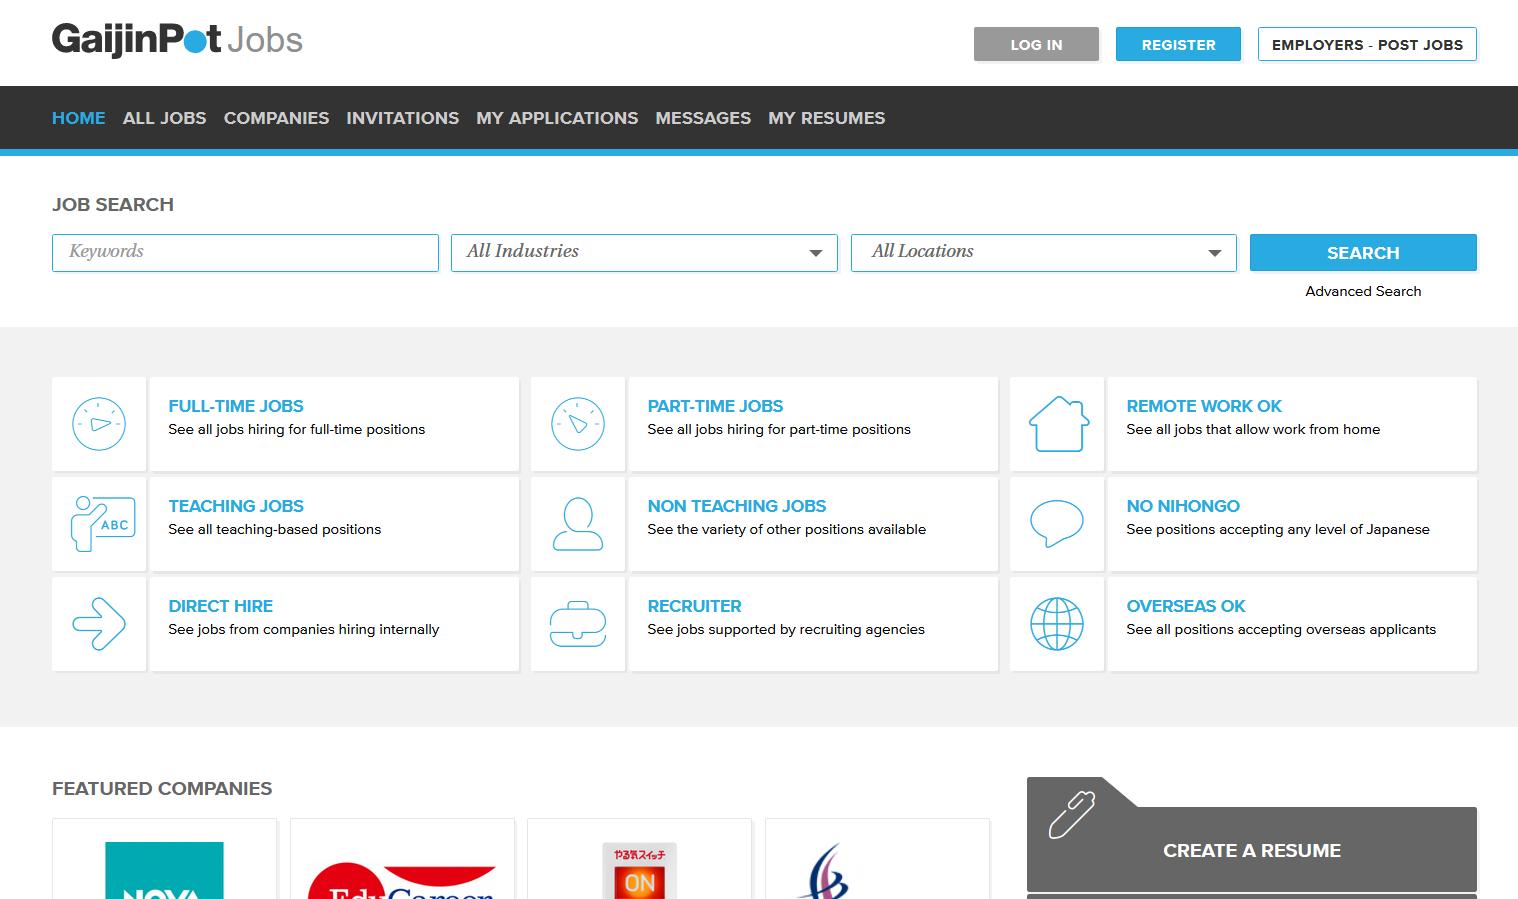 GaijinPot jobs web